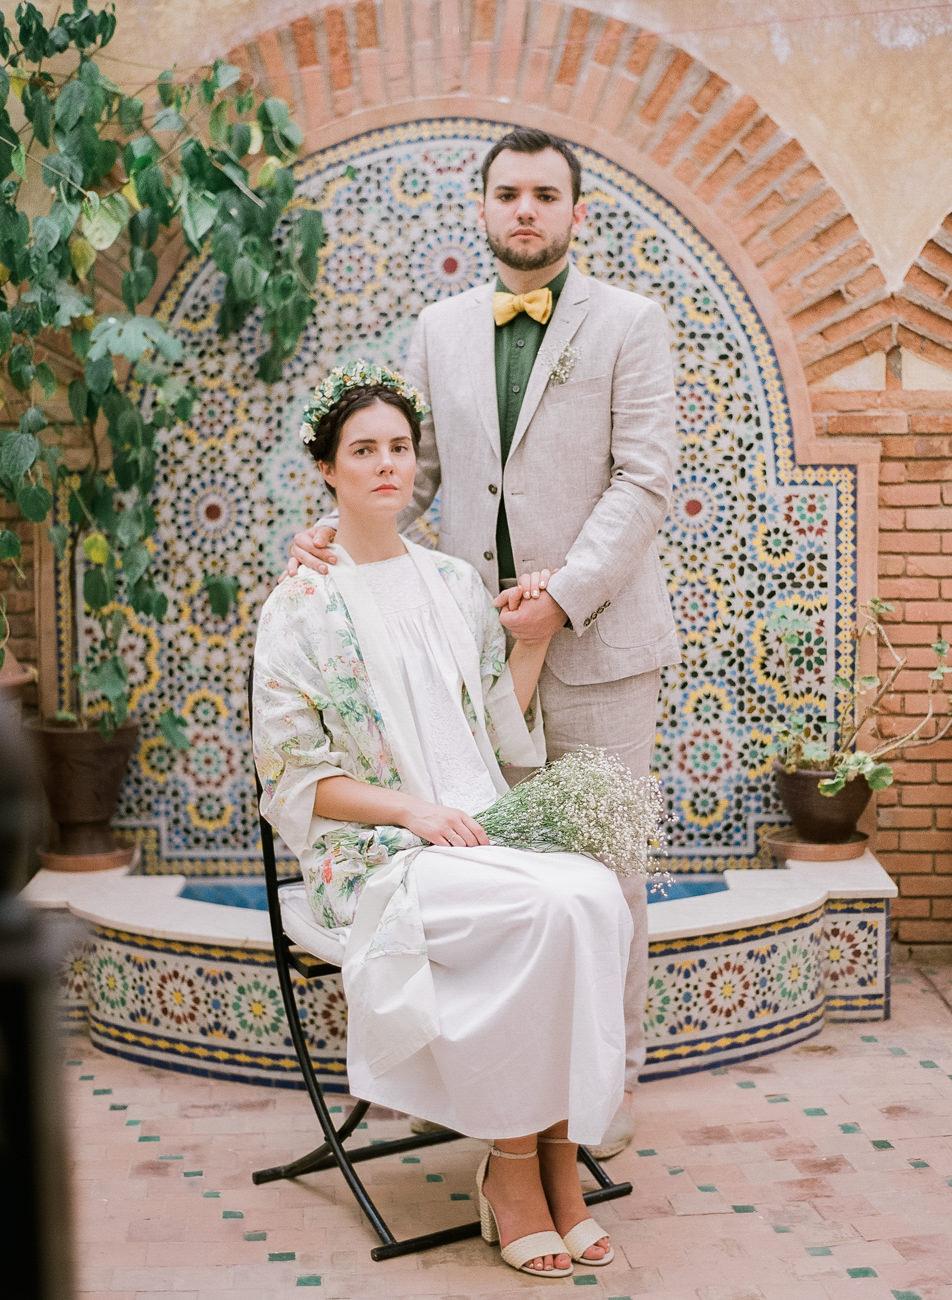 marrakech-photographe-mariage-alain-m-14.jpg